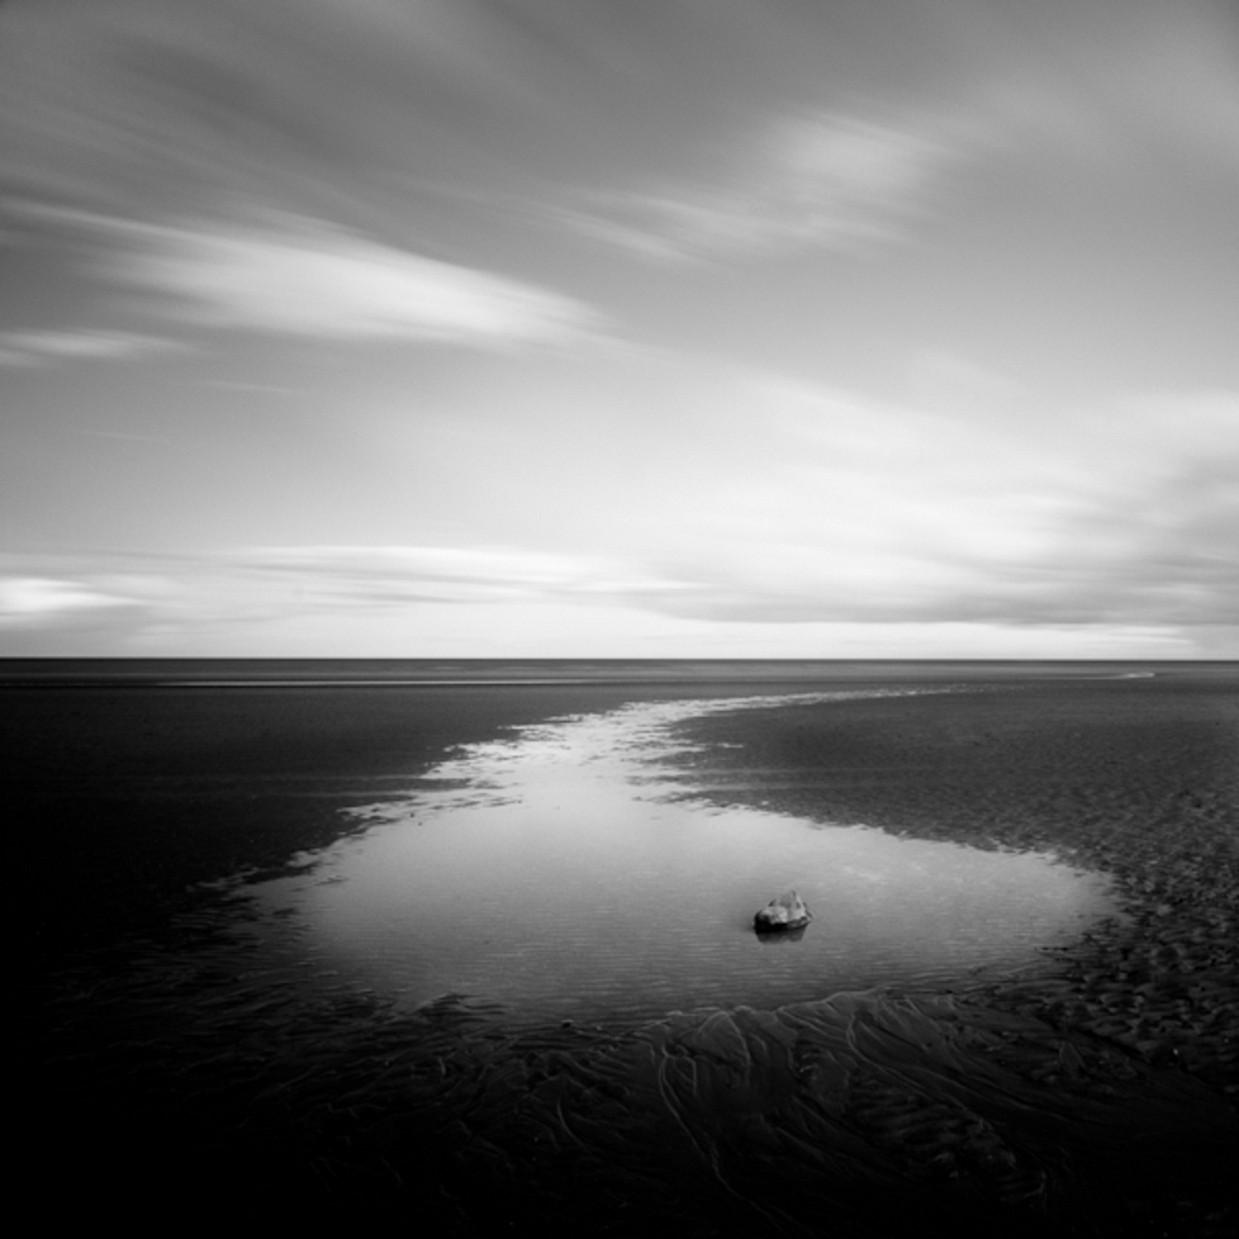 fotograf-Zoltan-Bekefi_5